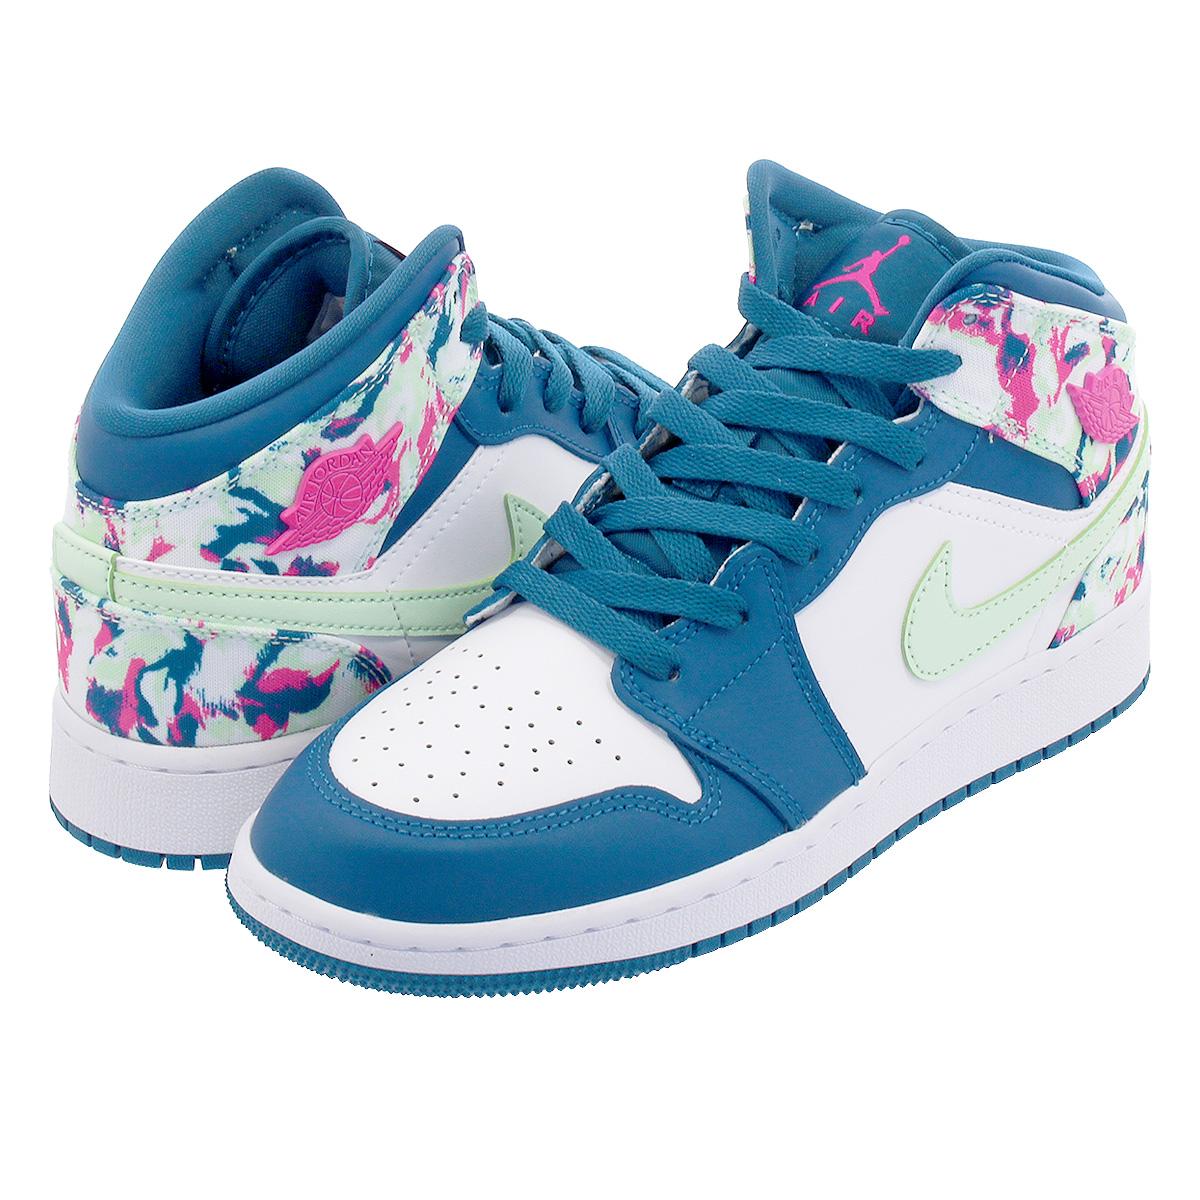 04112d1f9cddc0 LOWTEX BIG-SMALL SHOP  NIKE AIR JORDAN 1 MID GS Nike Air Jordan 1 ...